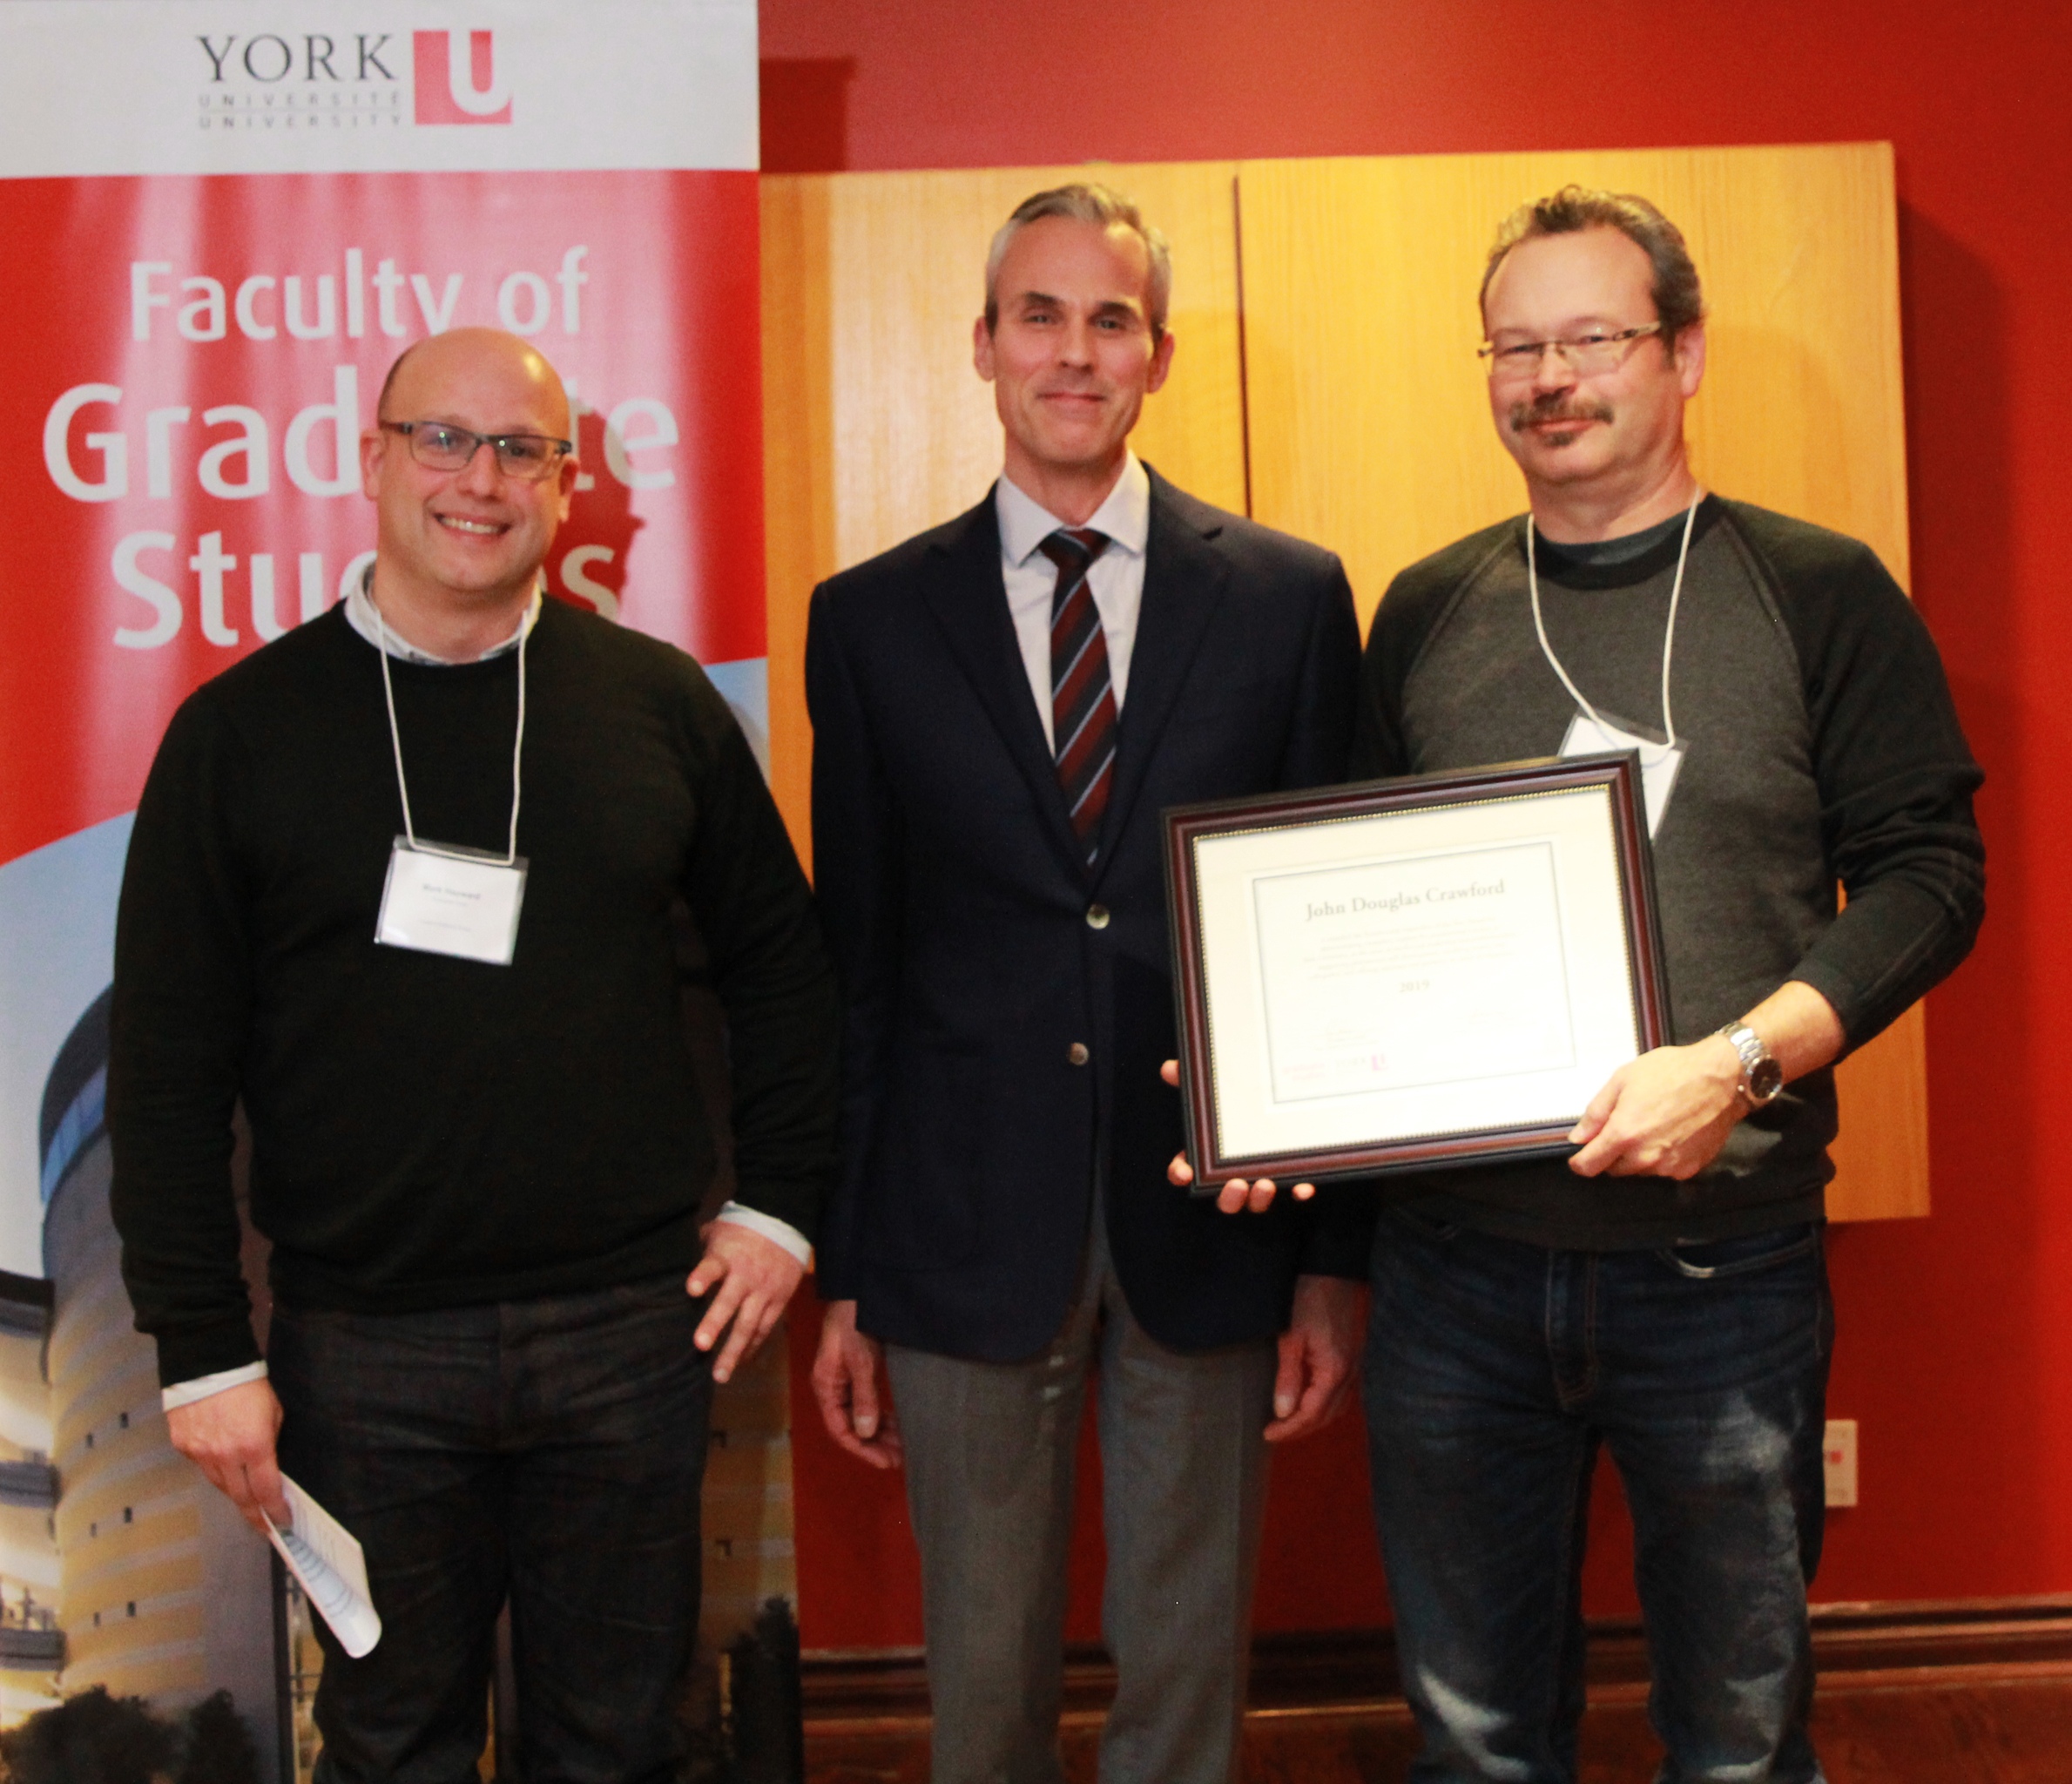 photo of Mark Hayward, Dean Thomas Loebel and Doug Crawford